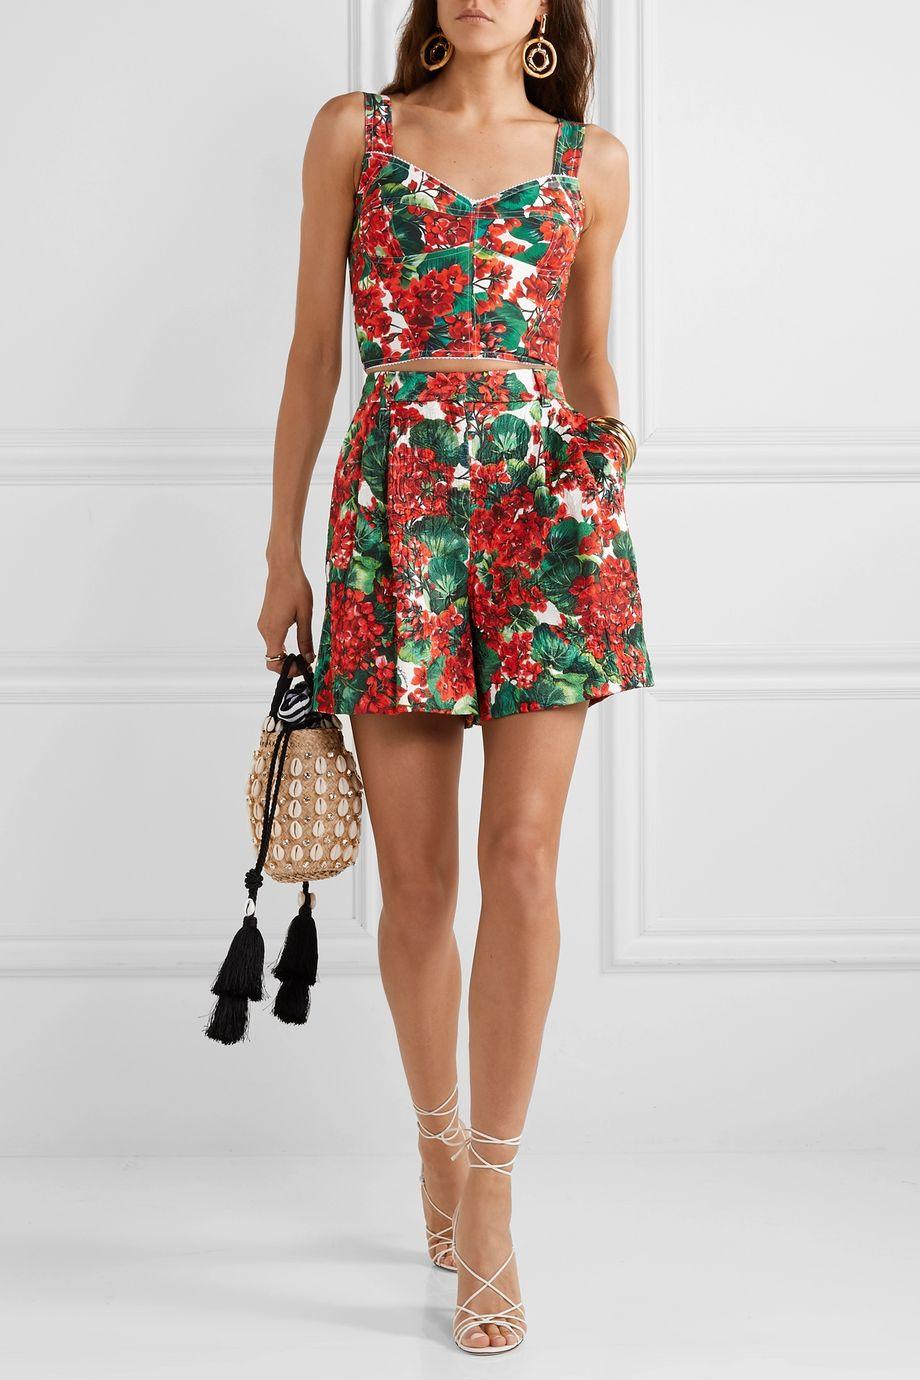 Dolce & Gabbana Floral-print cady bustier top